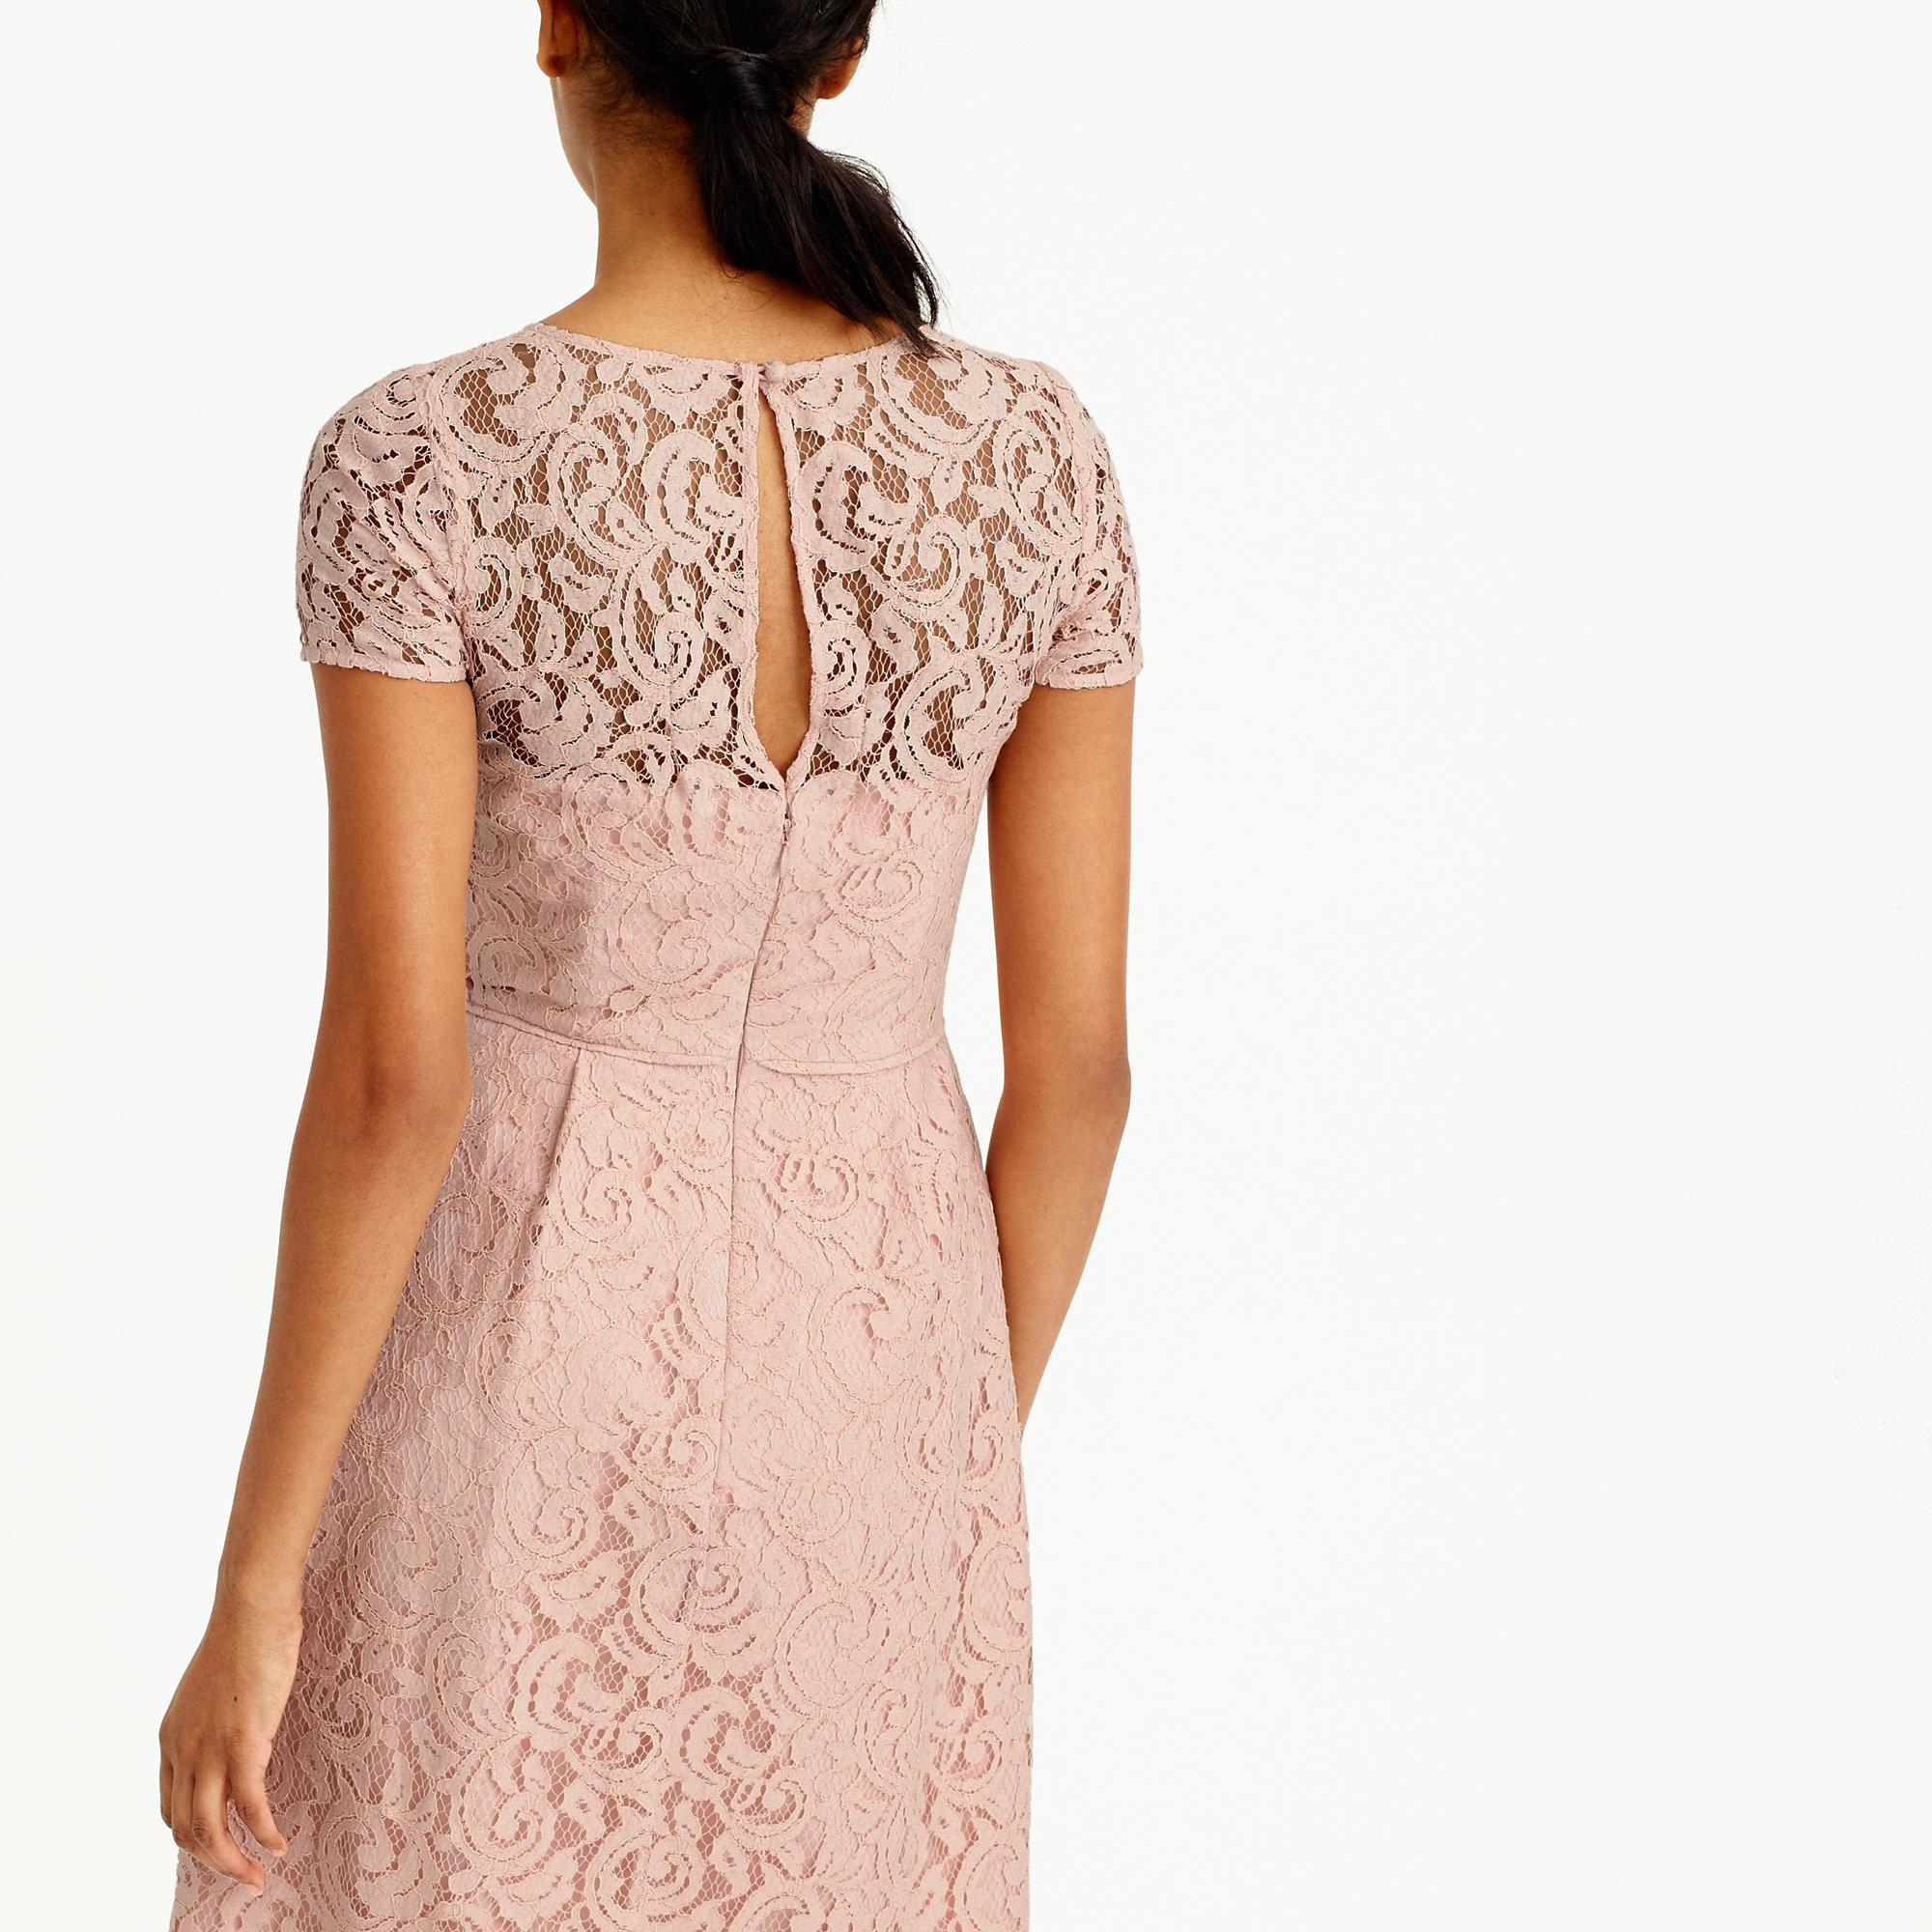 J.Crew Alisa Dress In Leavers Lace In Pink